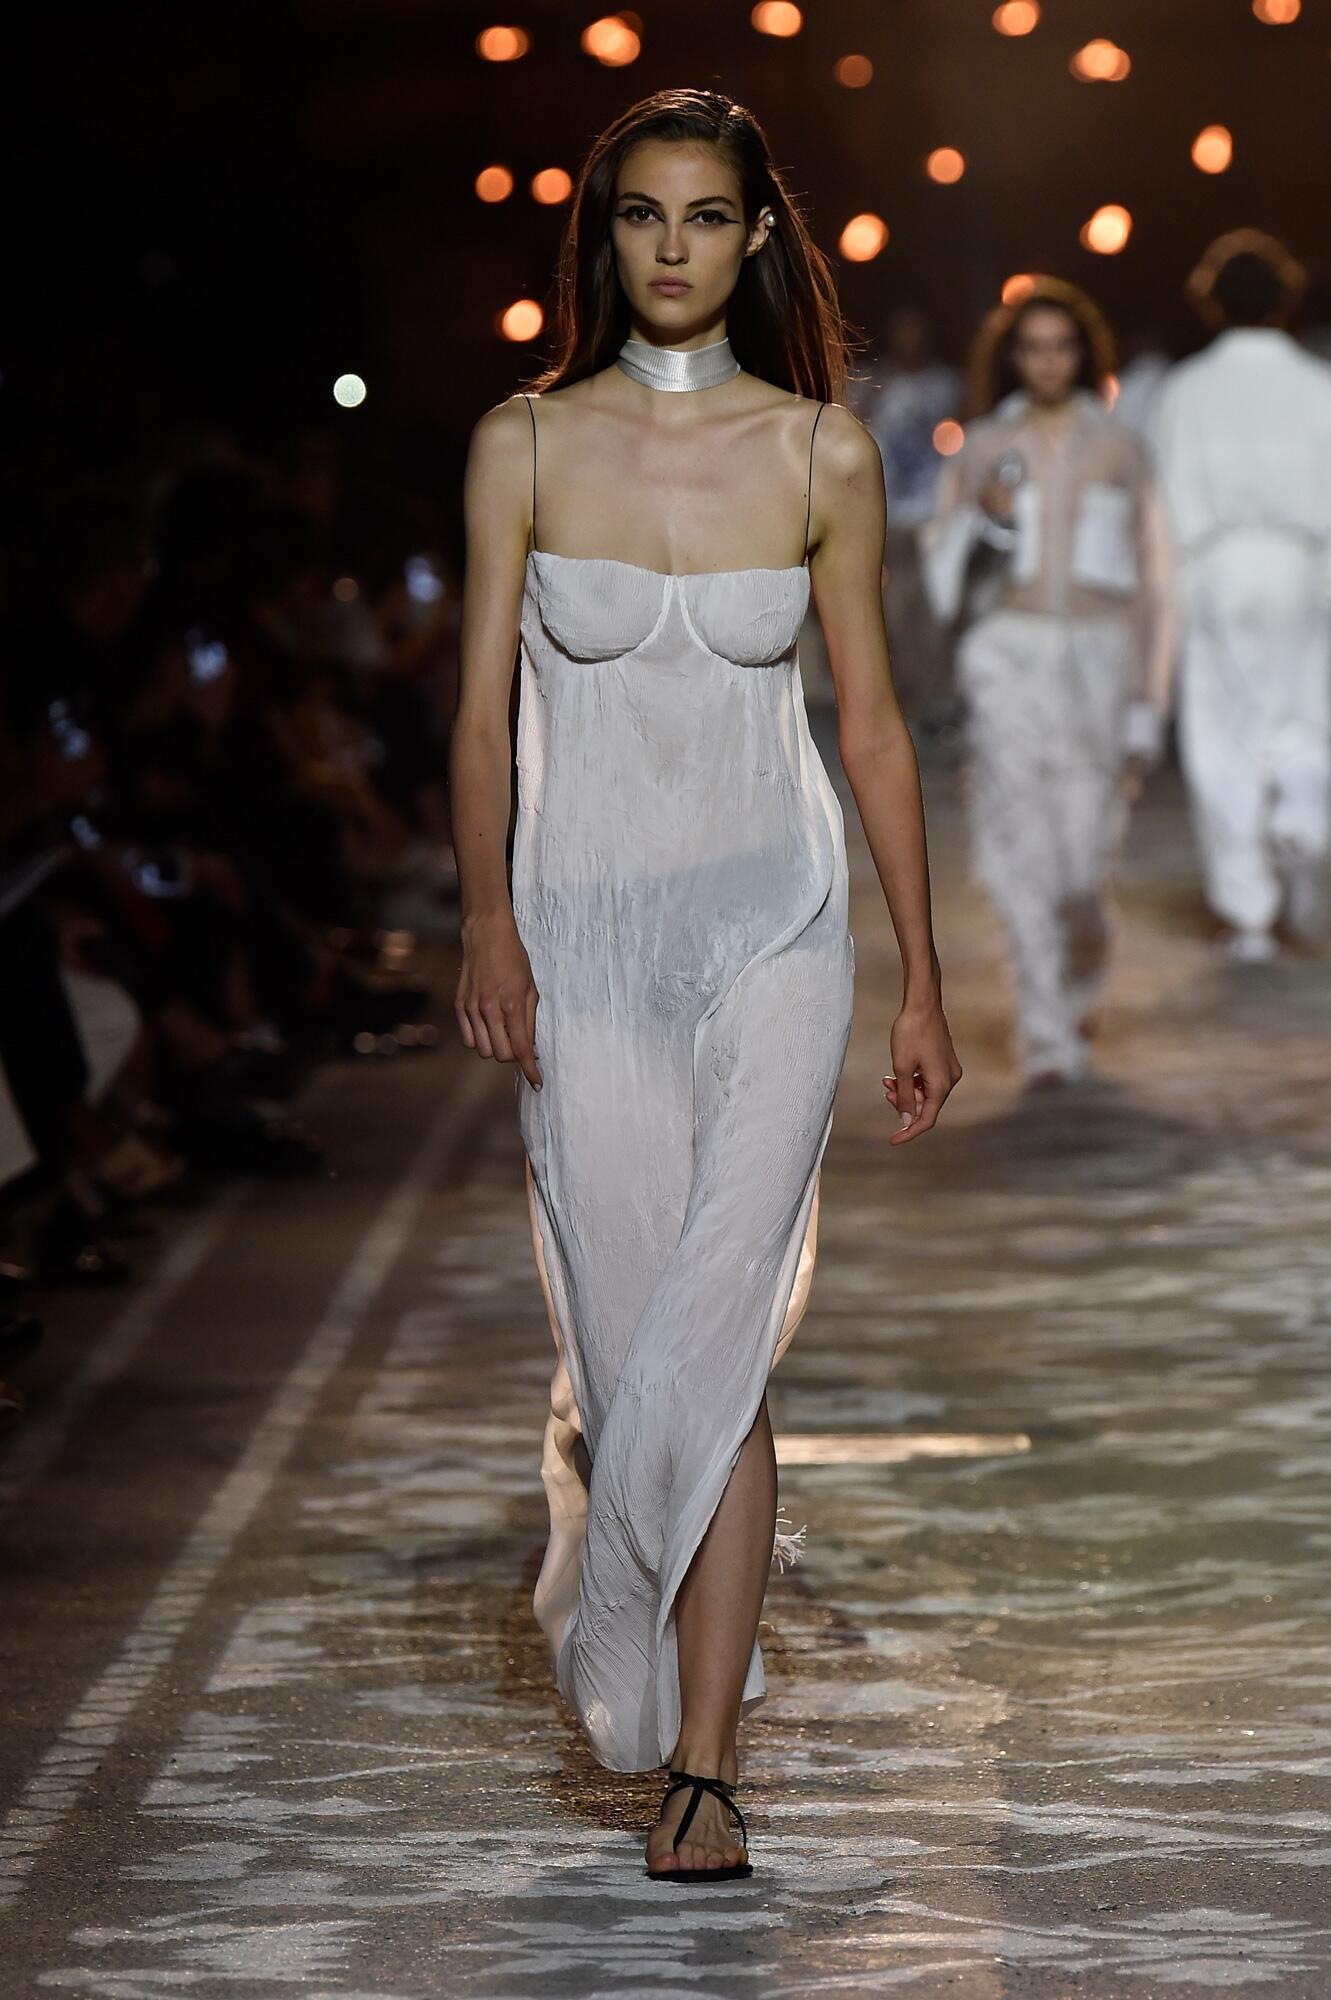 Woman Summer 2018 Fashion Trends Hugo